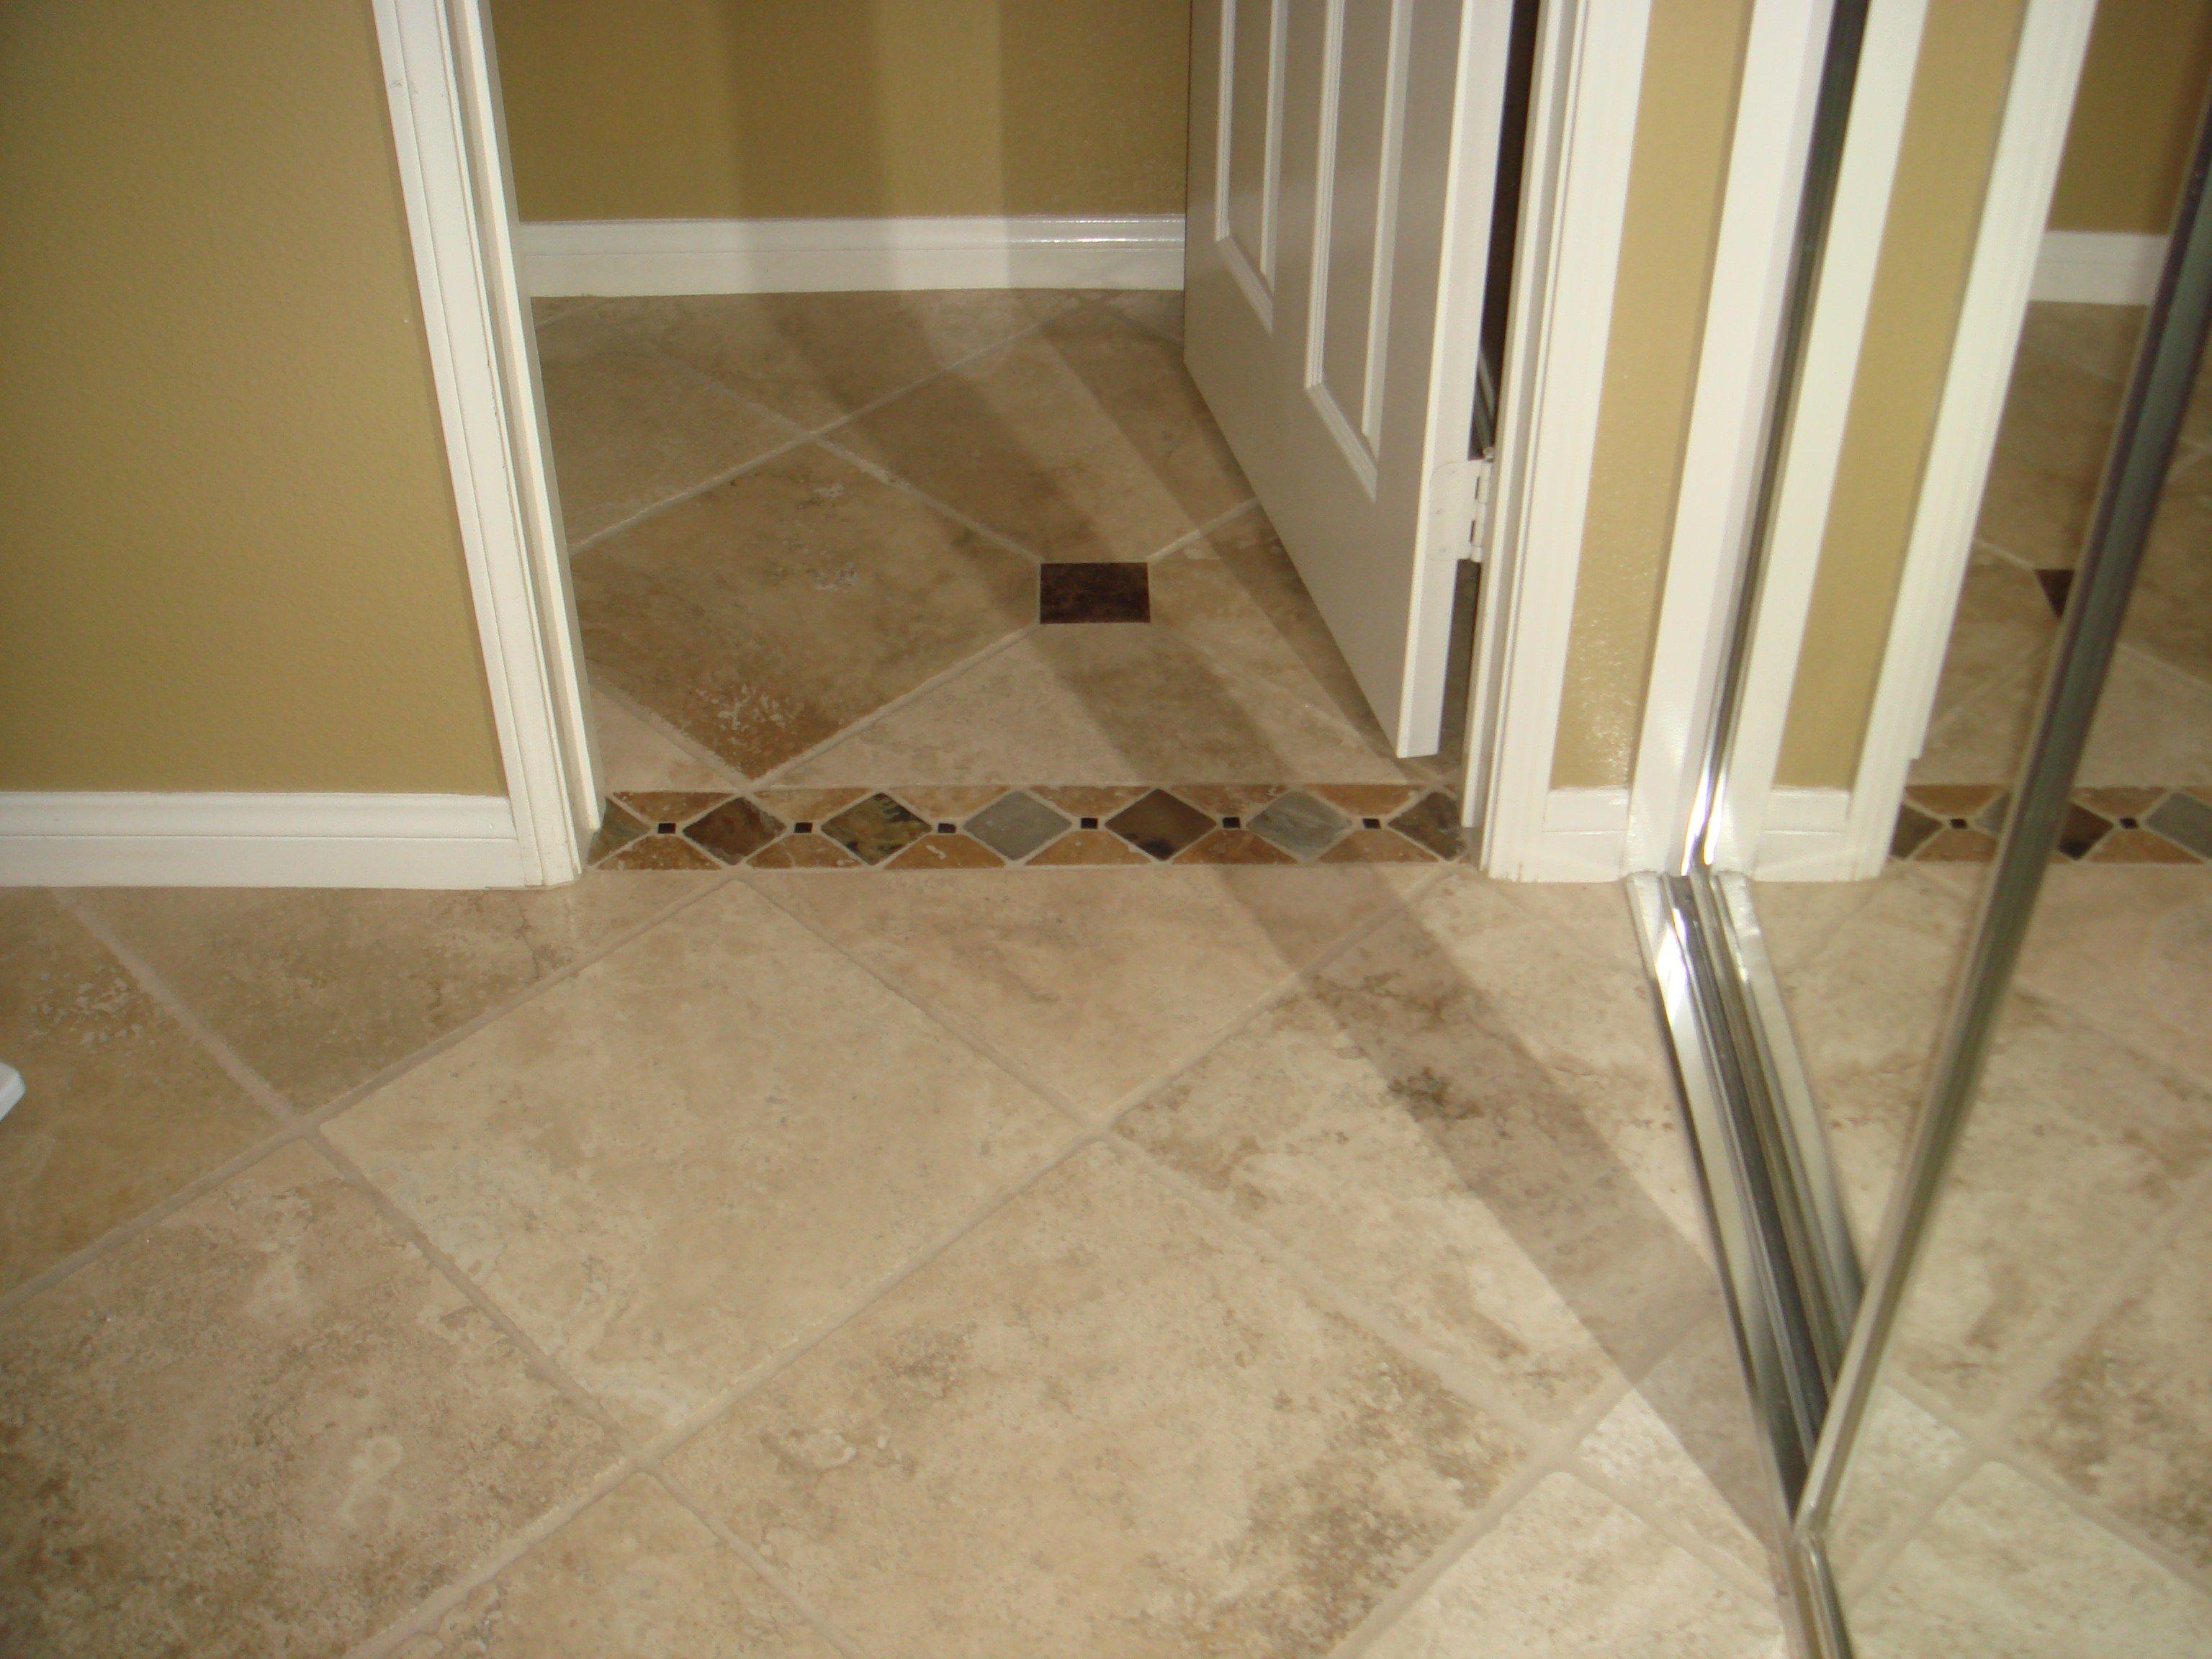 ideas tile glazed ceramic tile bathroom tile patterns tile ideas